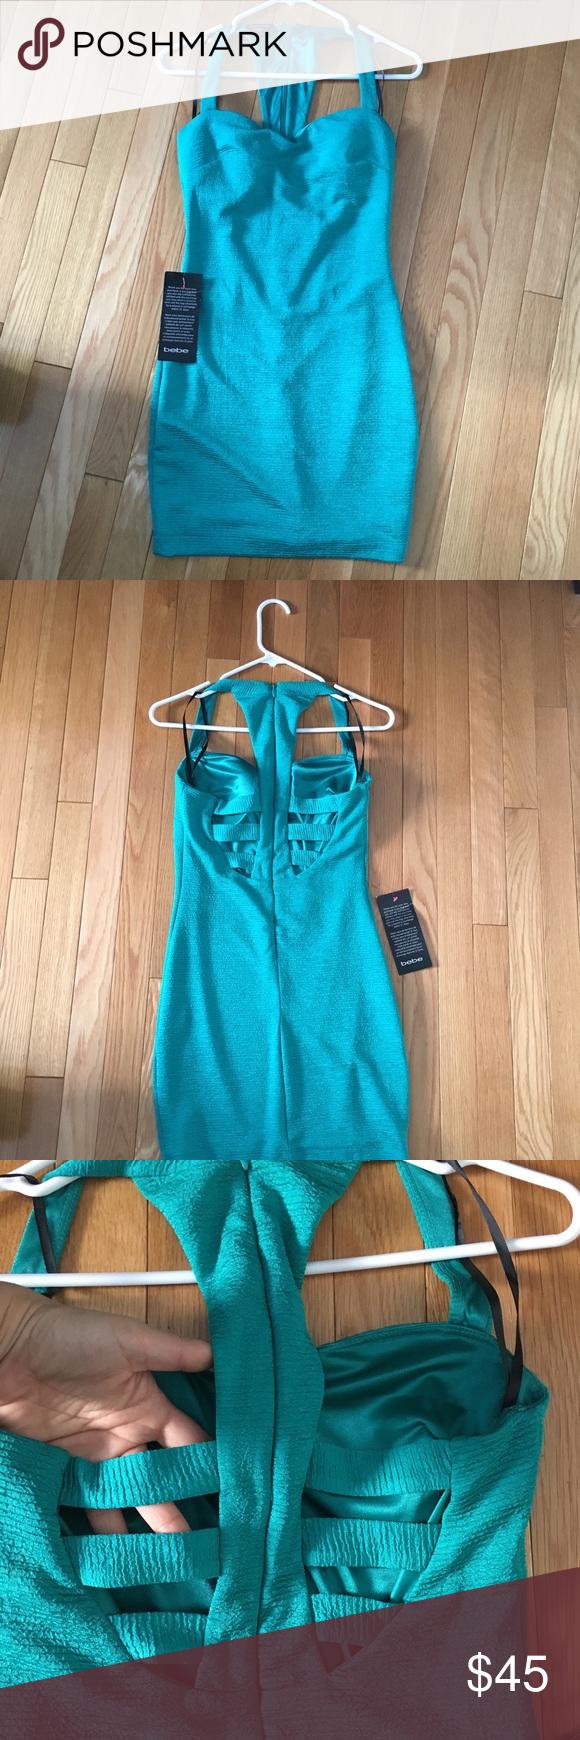 Bebe dress NWT | Bebe, Neckline and Teal